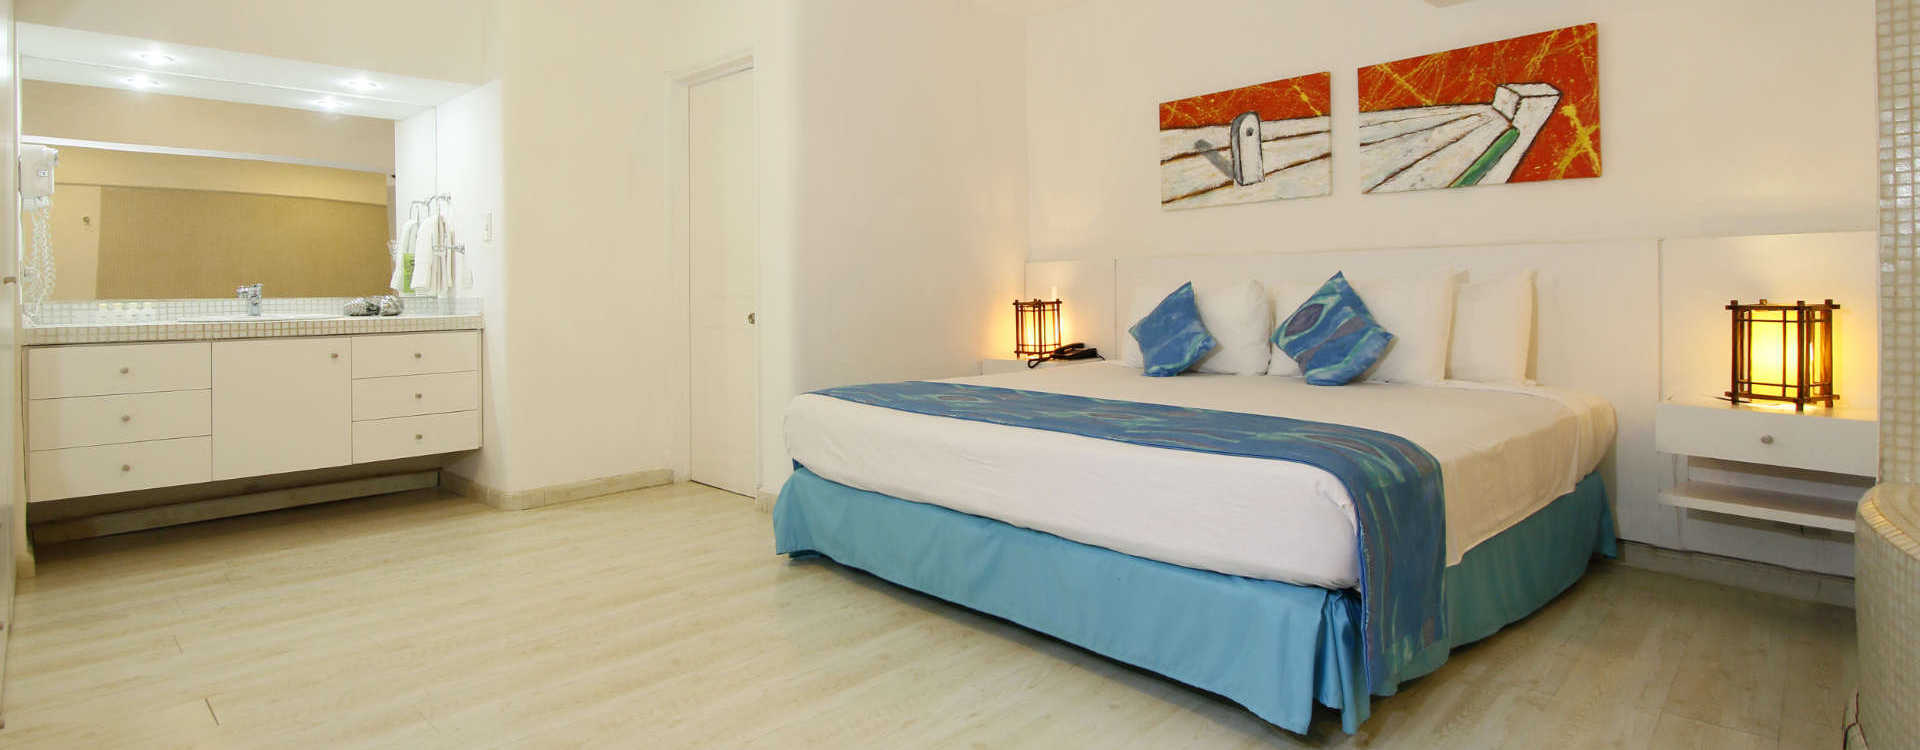 Sunsol Caribbean Beach Habitaciones